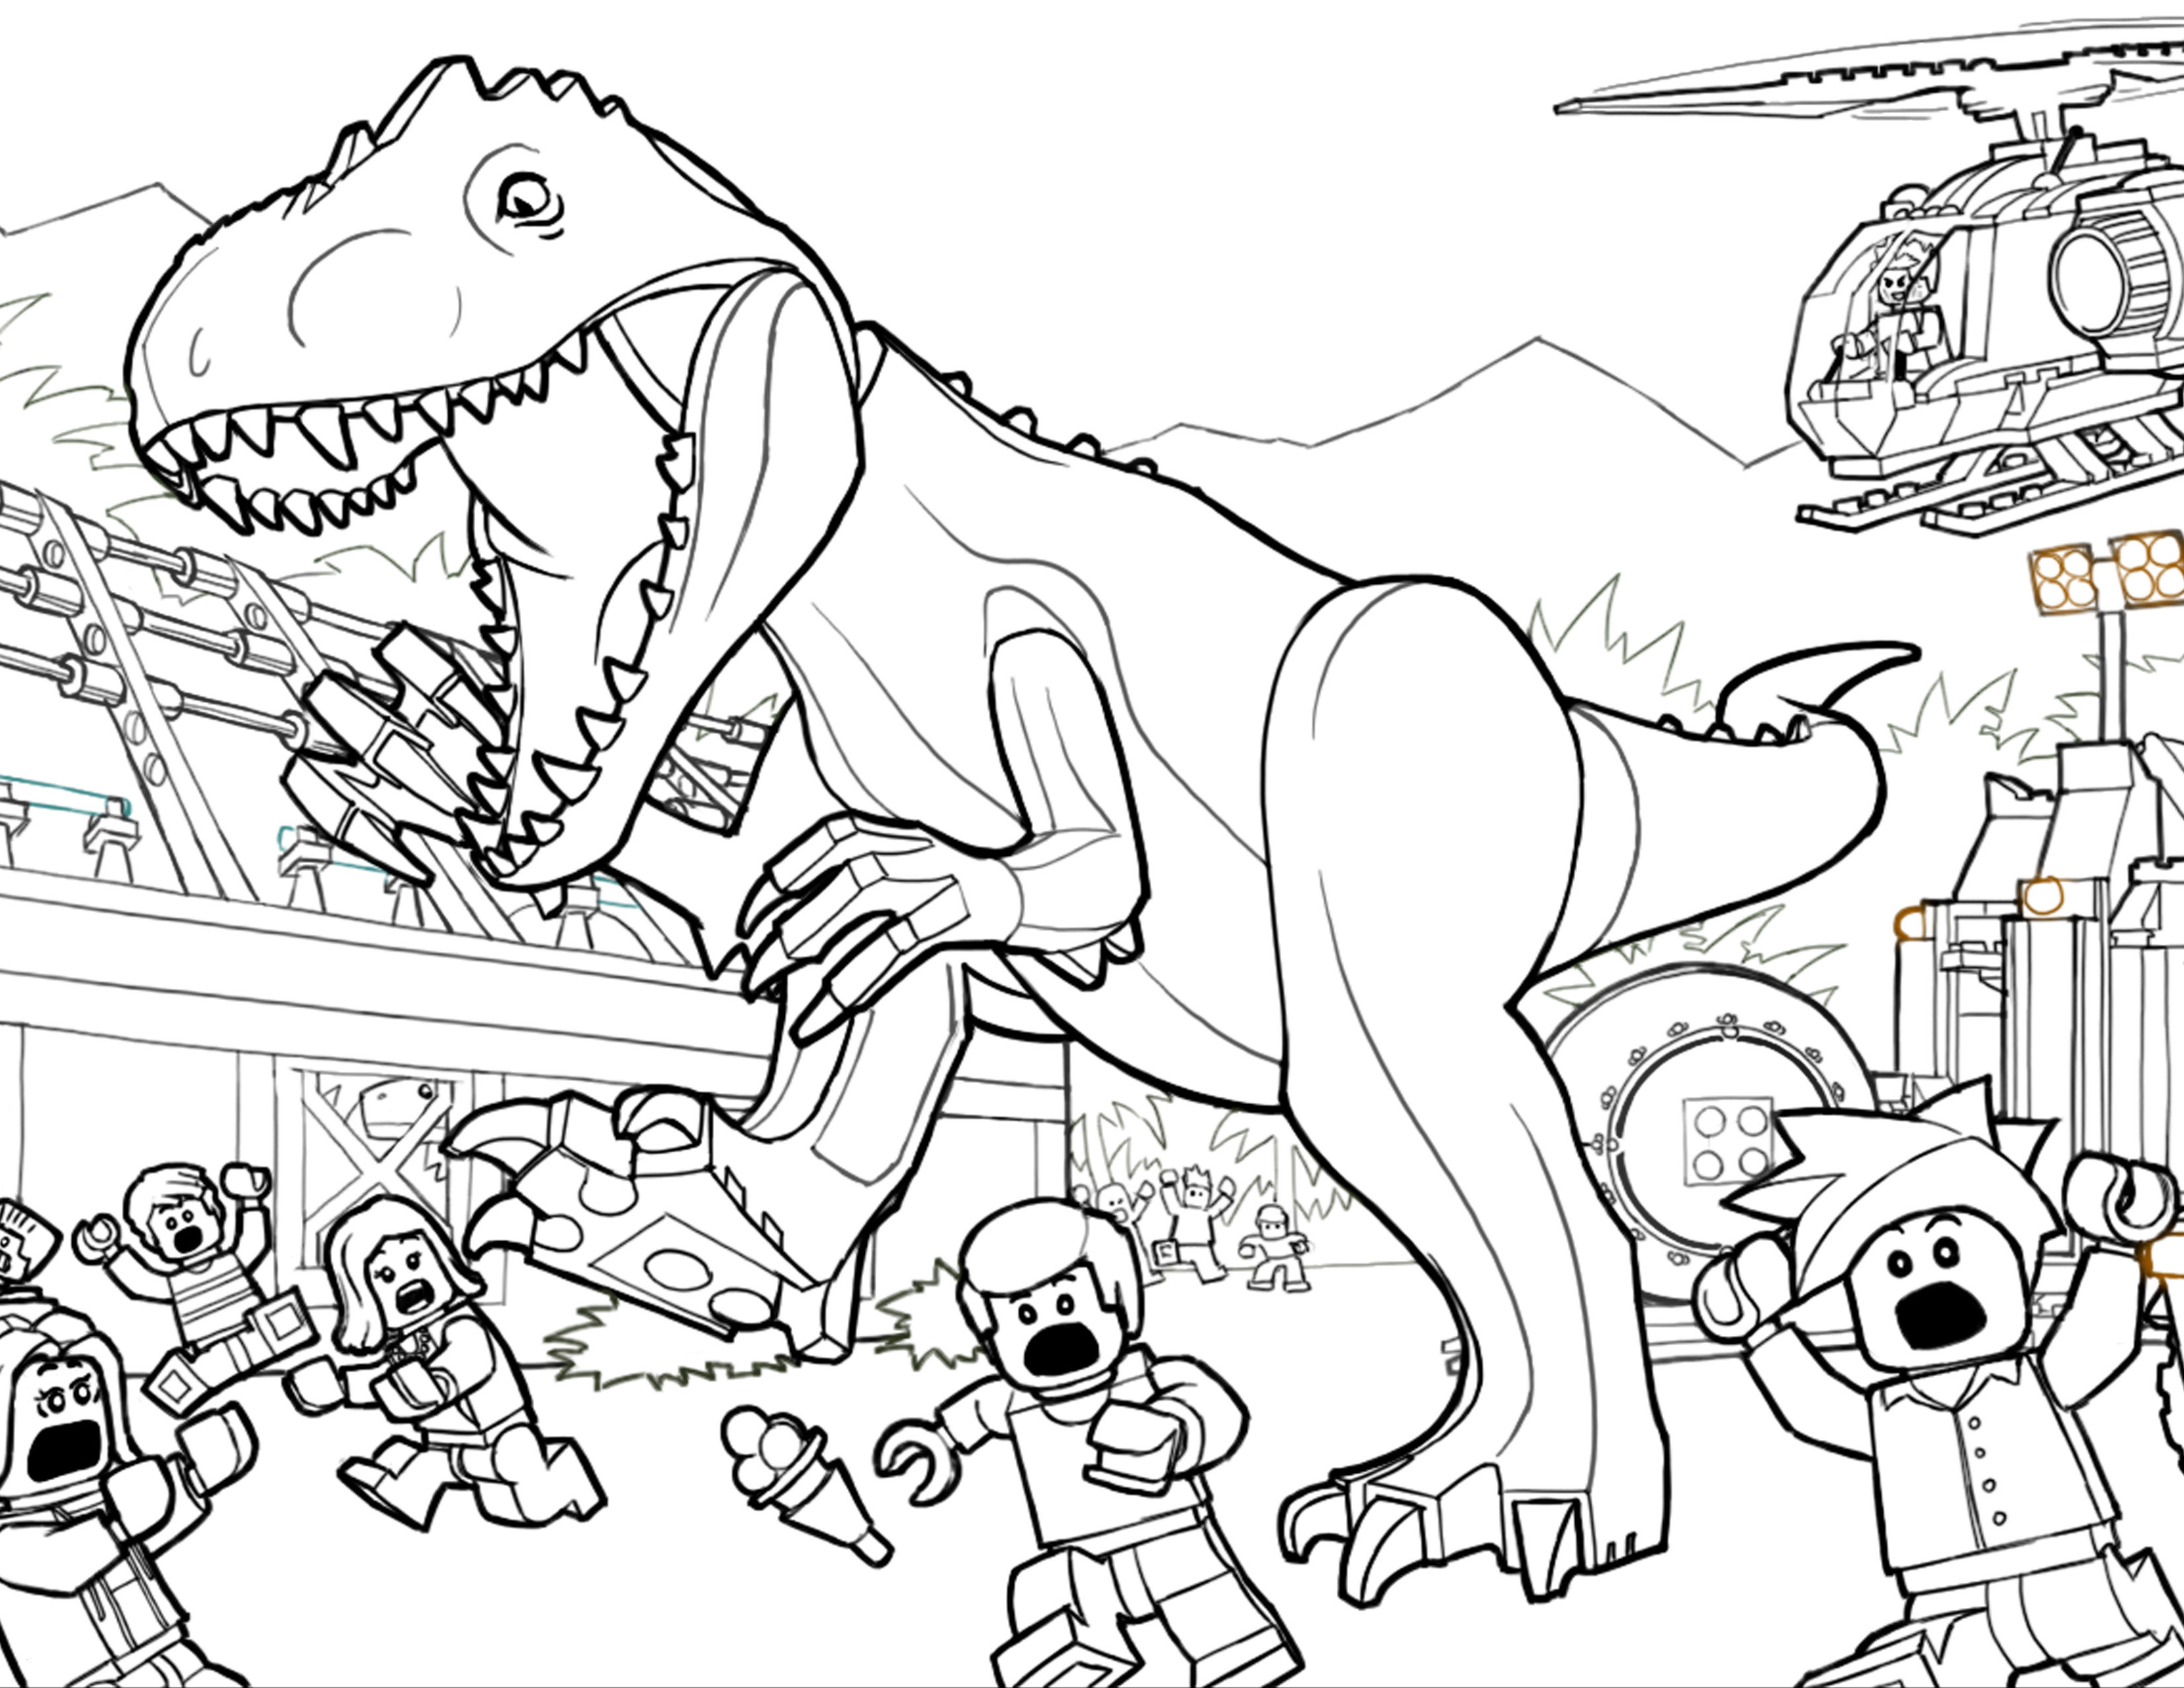 Jurassic Park Ausmalbilder Frisch 35 Elsa Malvorlagen Scoredatscore Luxus Ausmalbilder Jurassic Park Fotos